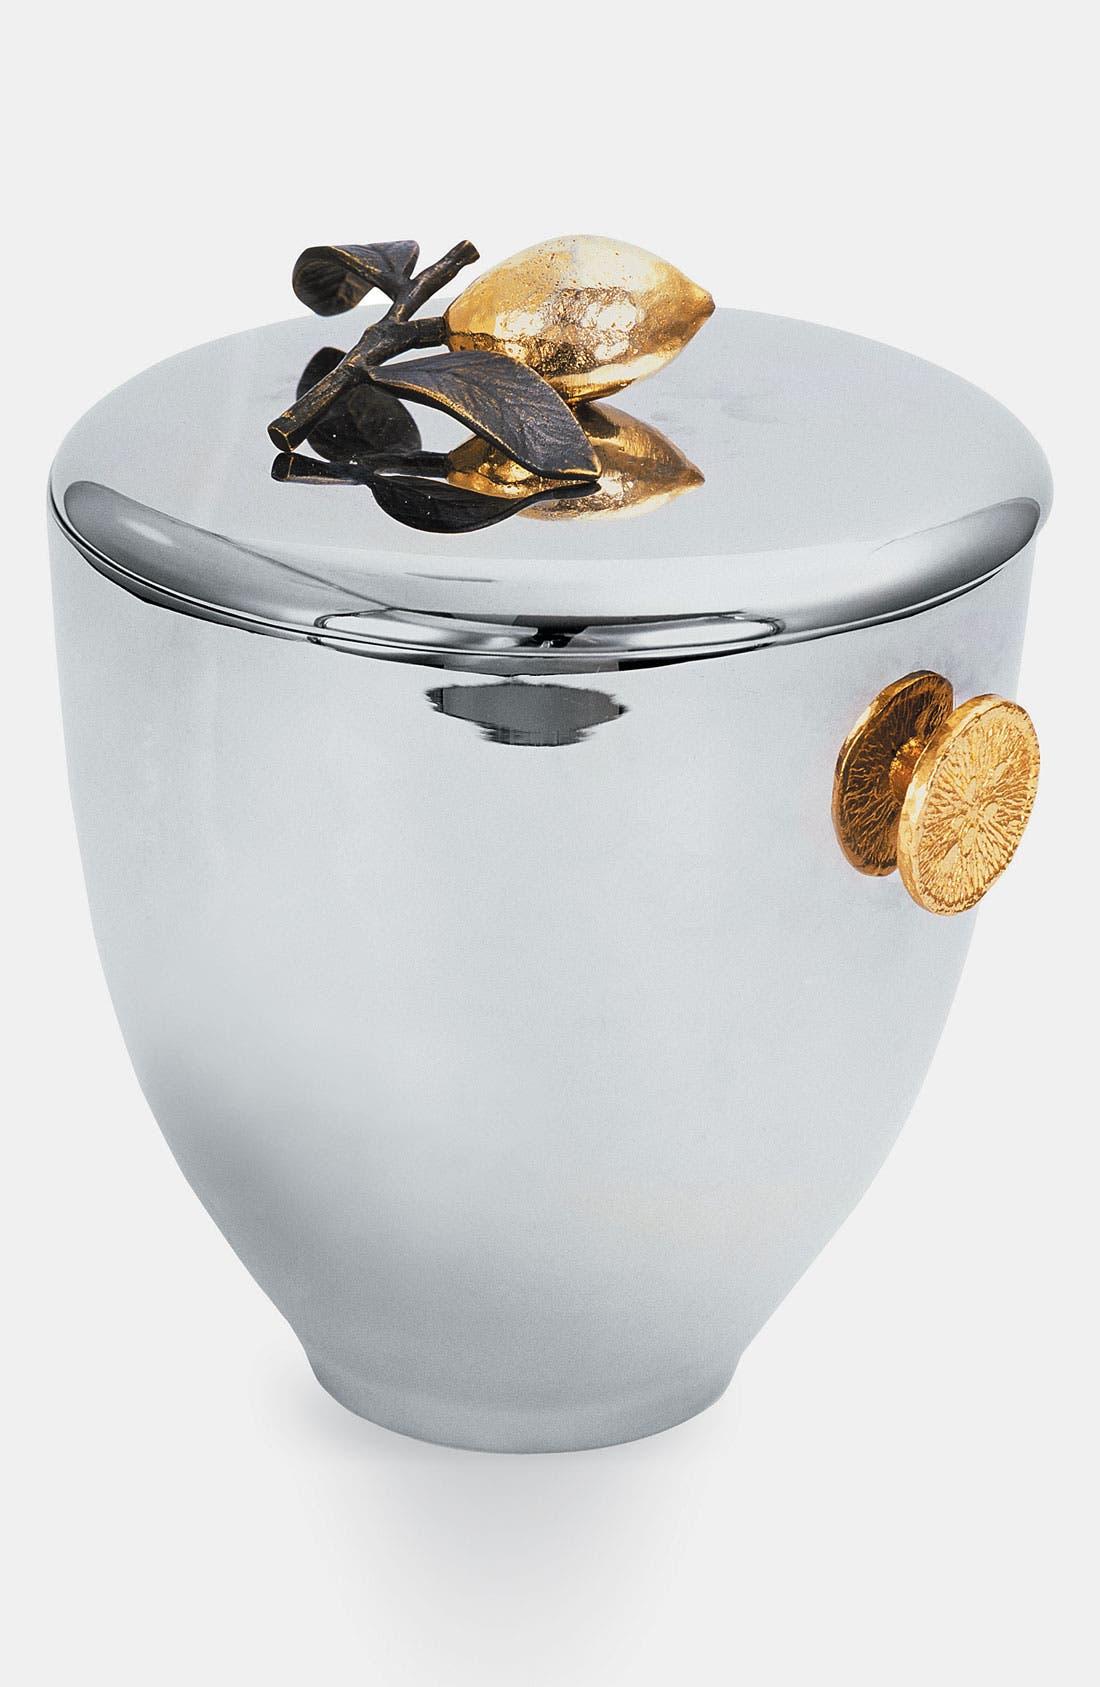 Main Image - Michael Aram 'Lemonwood' Ice Bucket